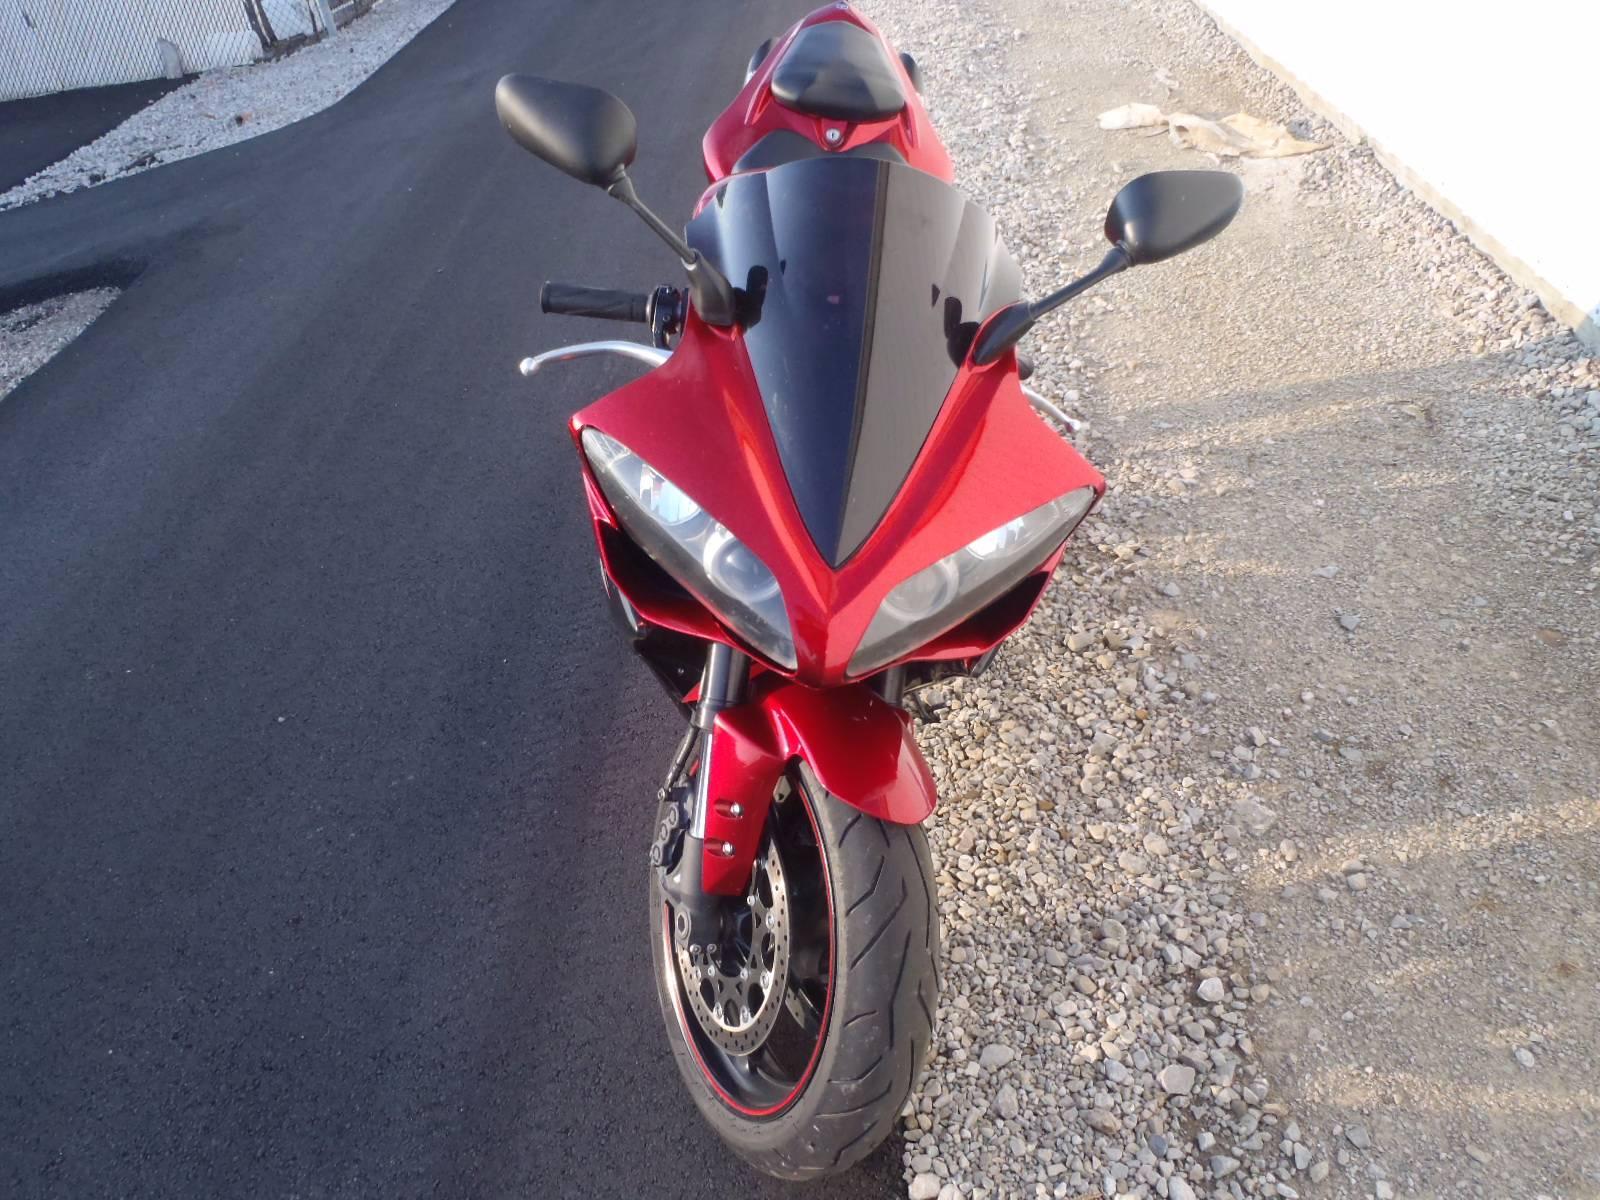 2007 Yamaha YZF-R1 8